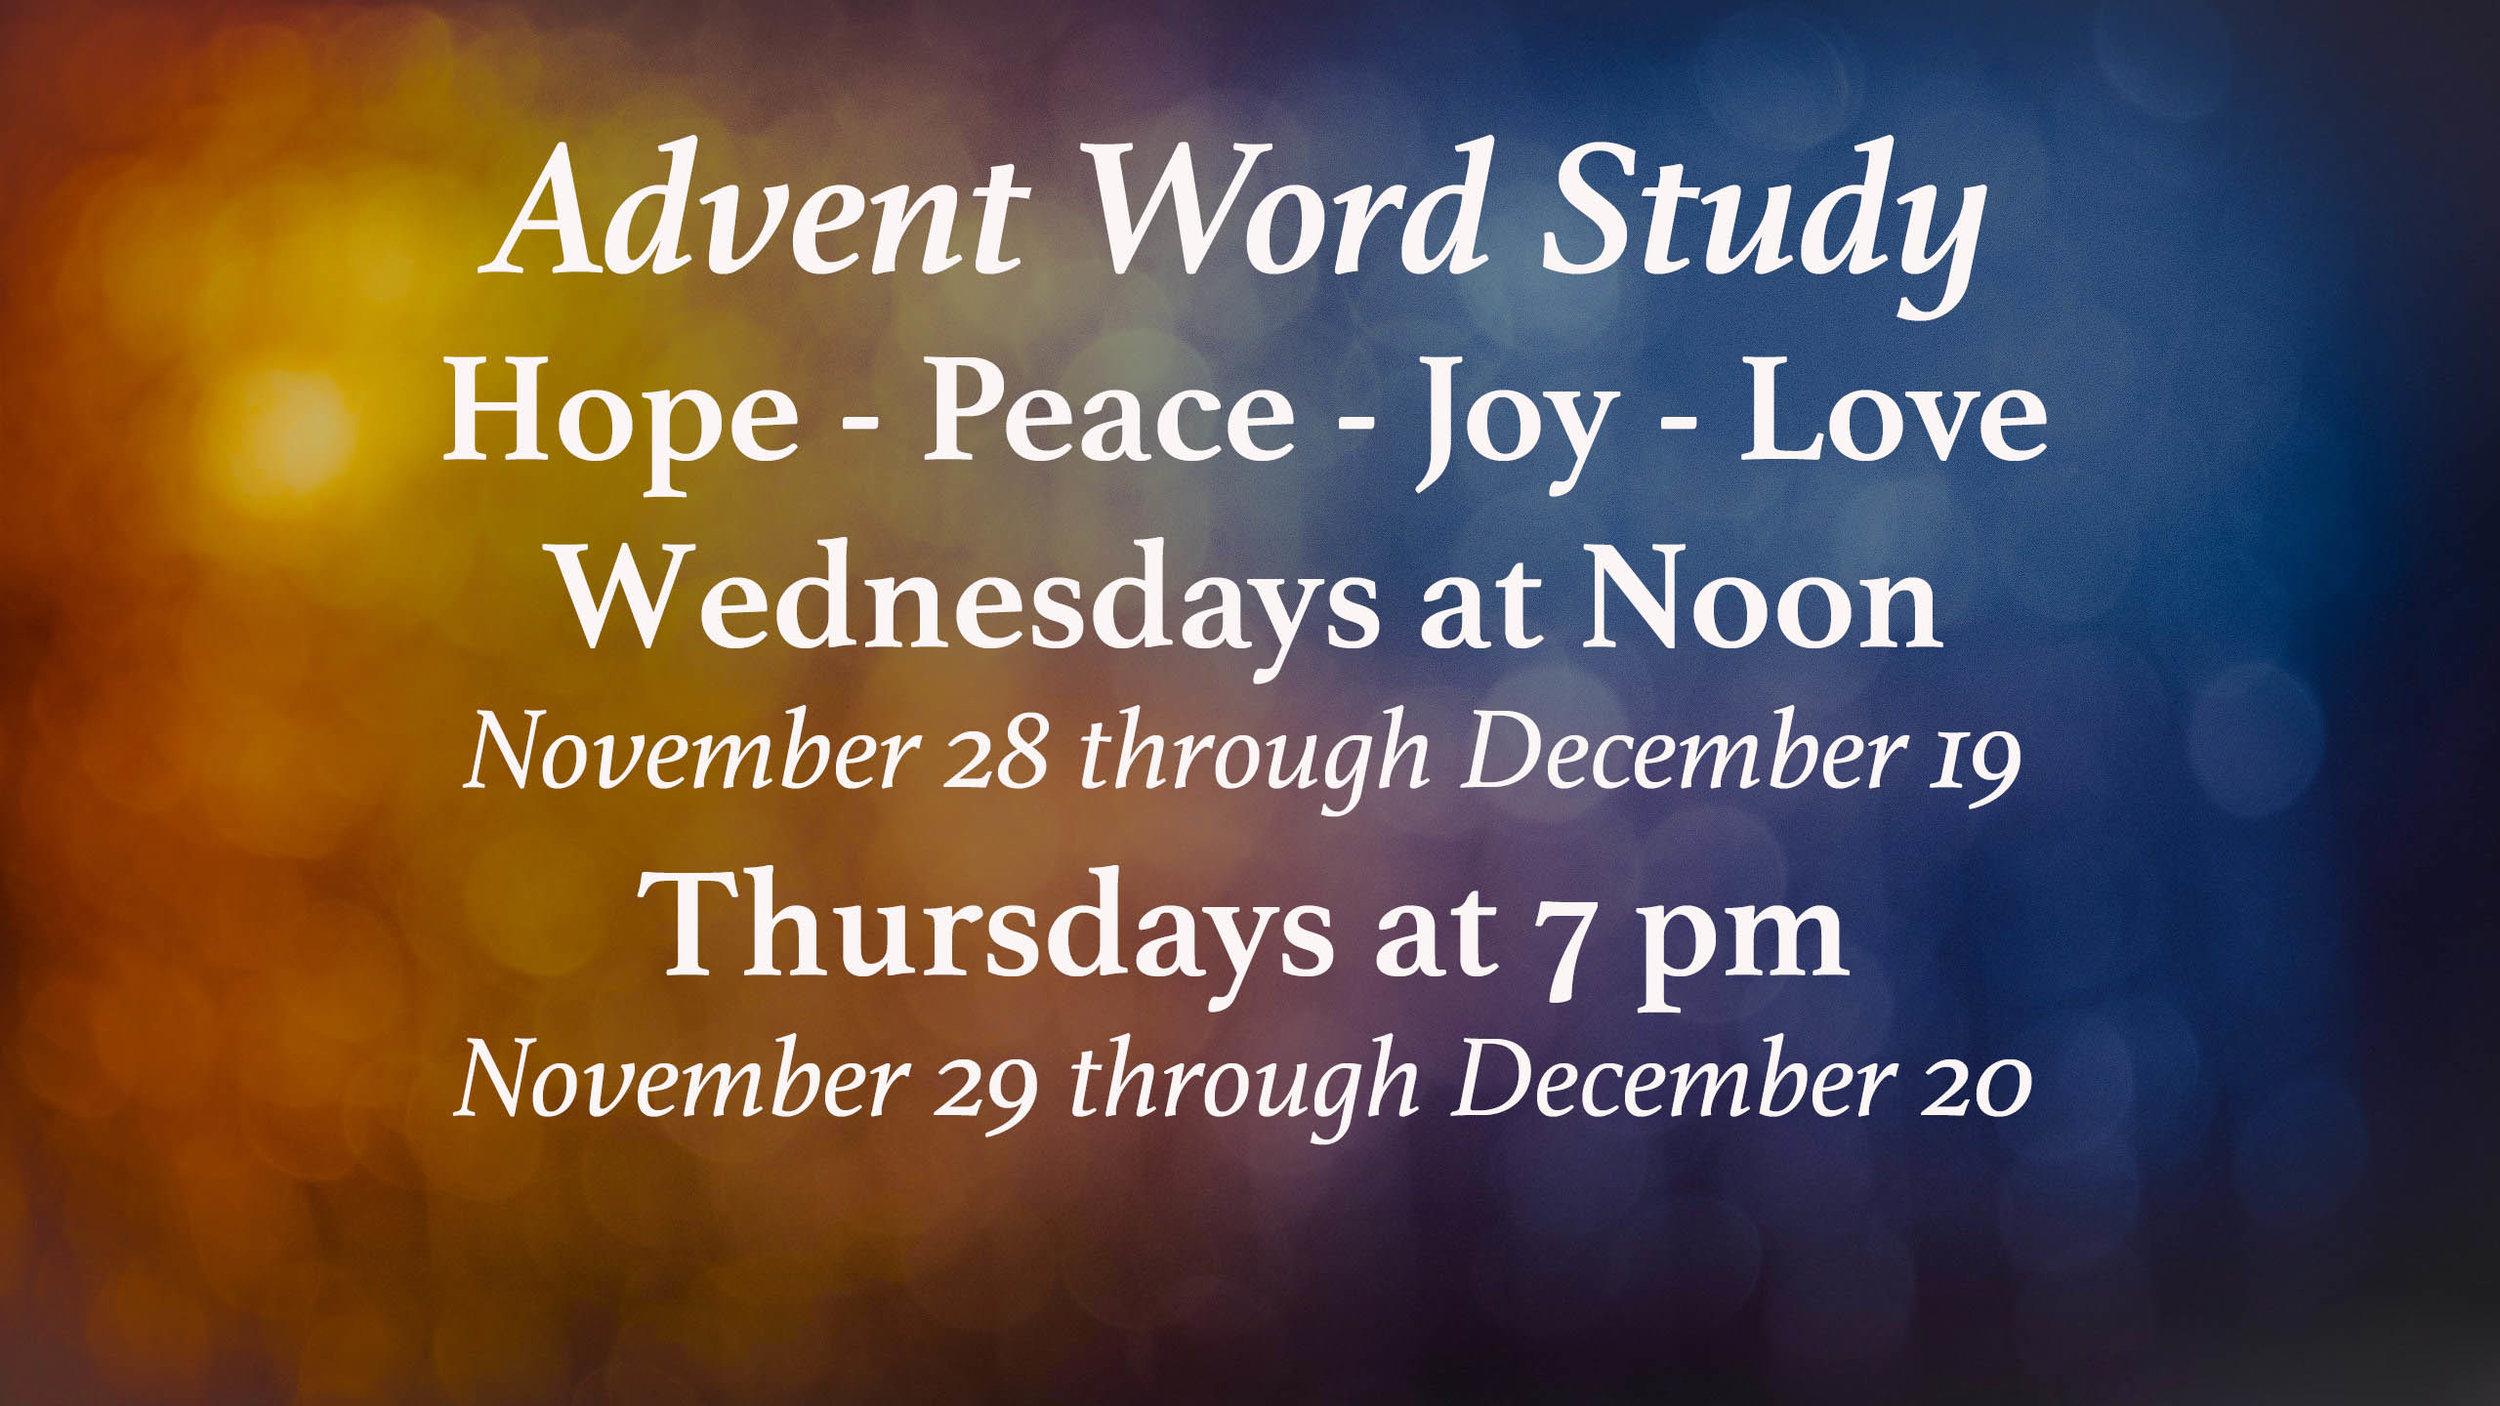 2018 Advent Word Study.jpg